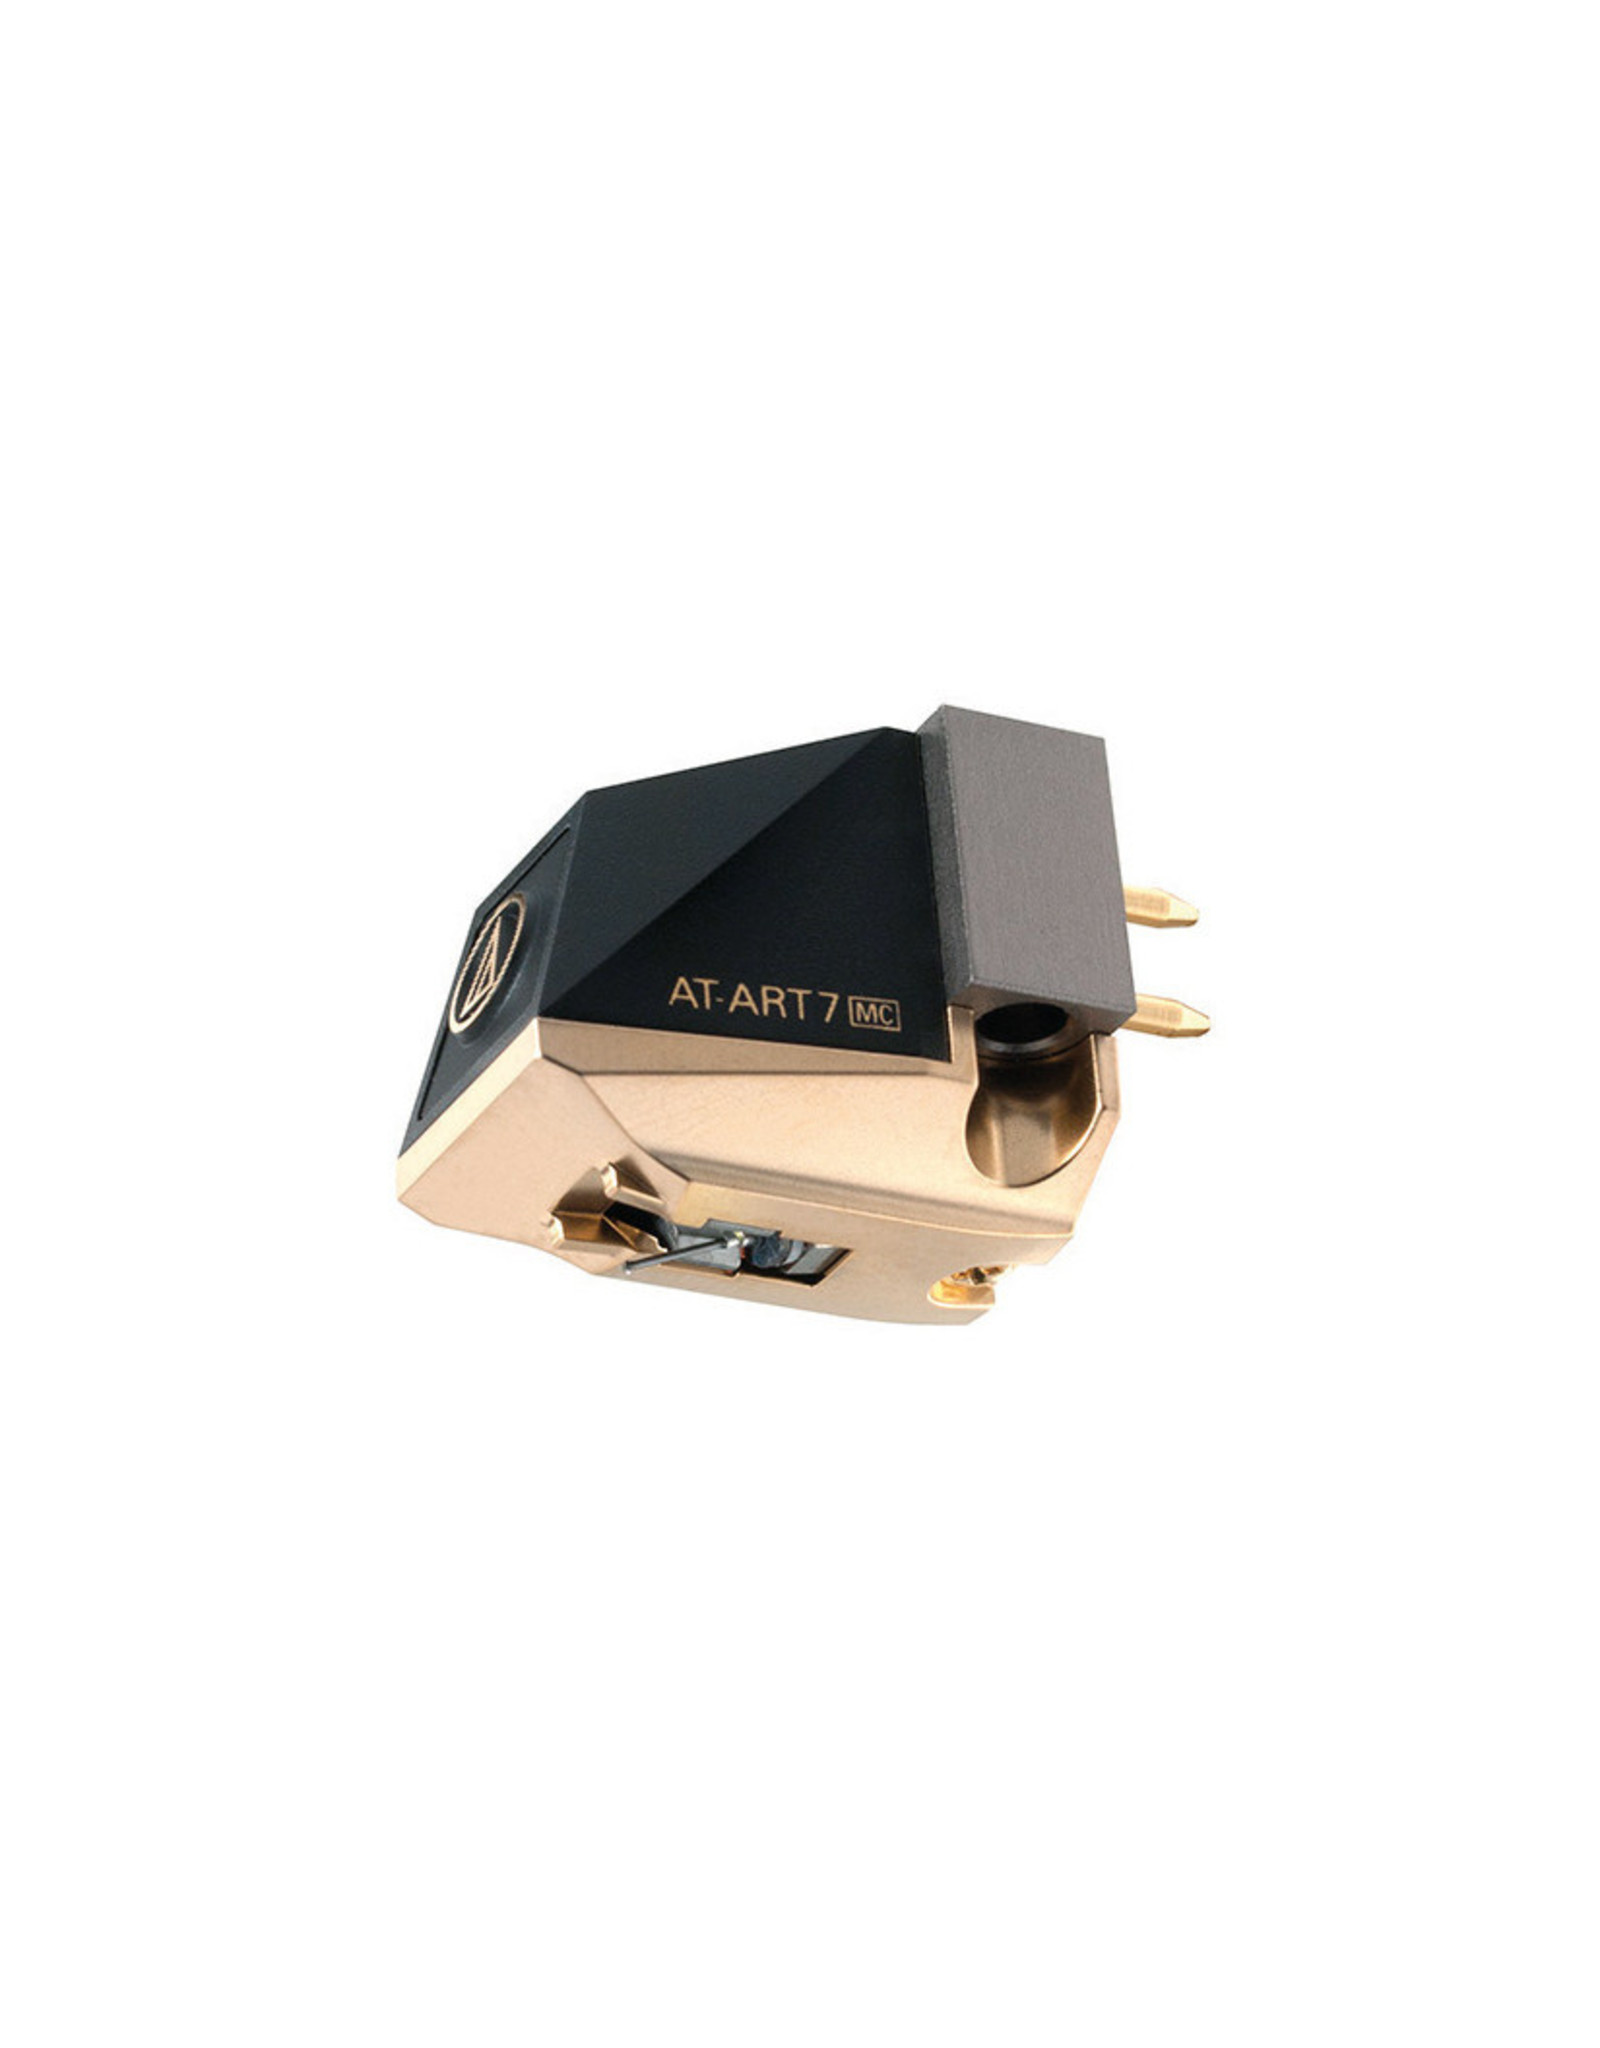 Audio-Technica Audio-Technica AT-ART7 Special Line Contact MC Phono Cartridge